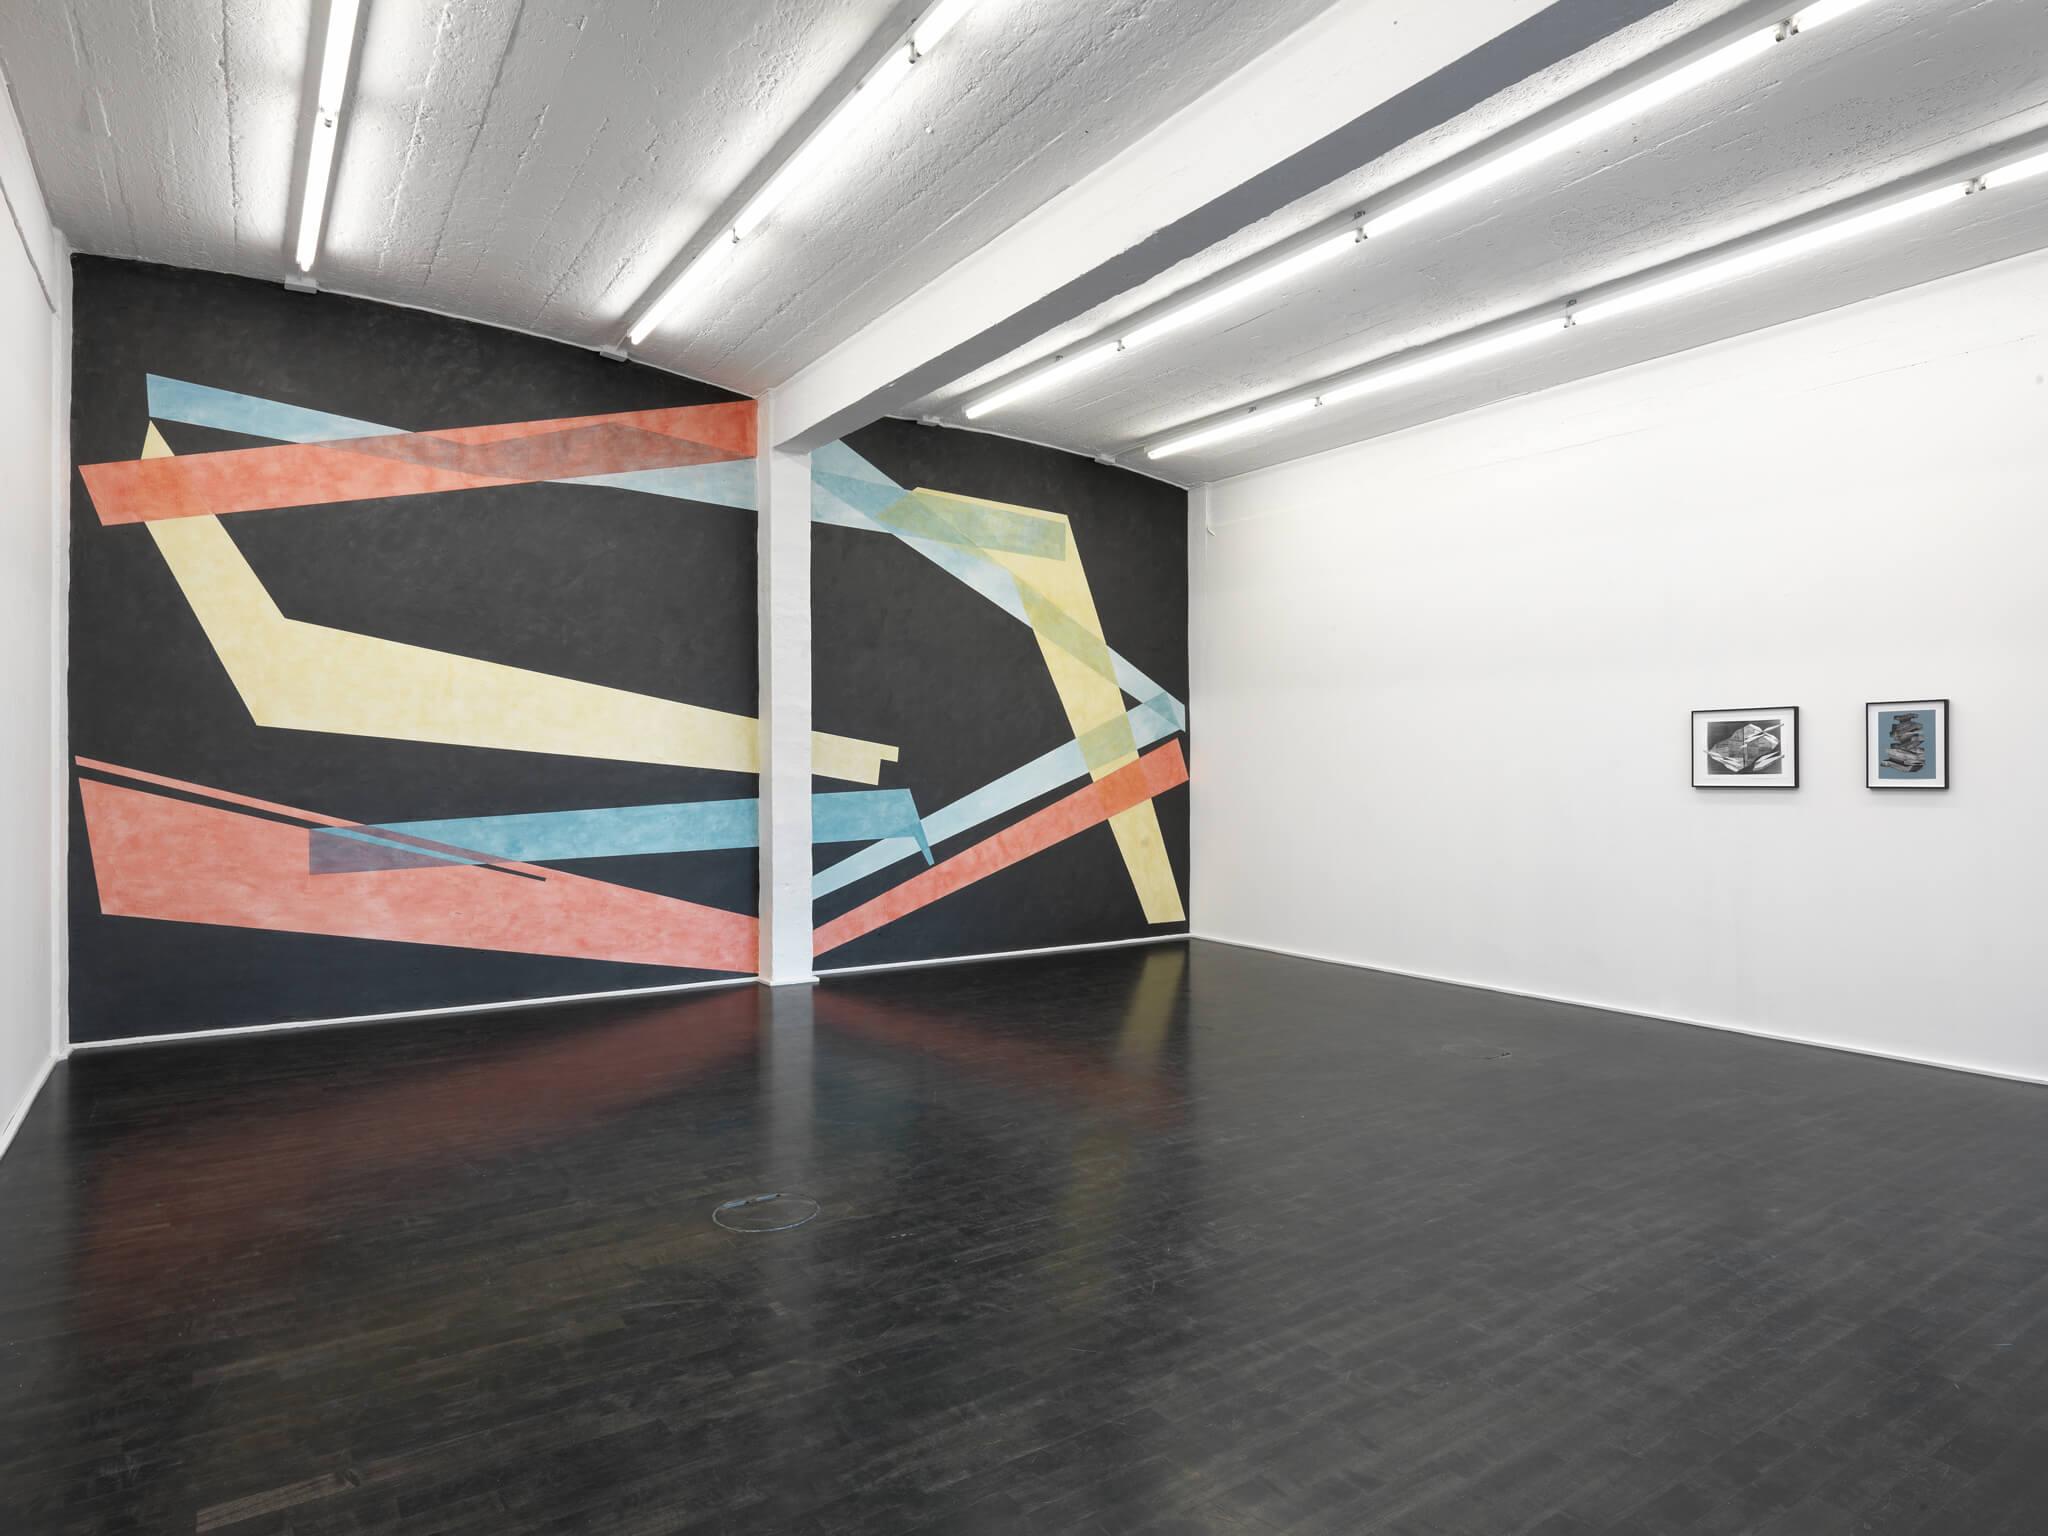 57_Frauke-Dannert_Installation_displaced_2015_Galerie-Rupert-Pfab,-Düsseldorf